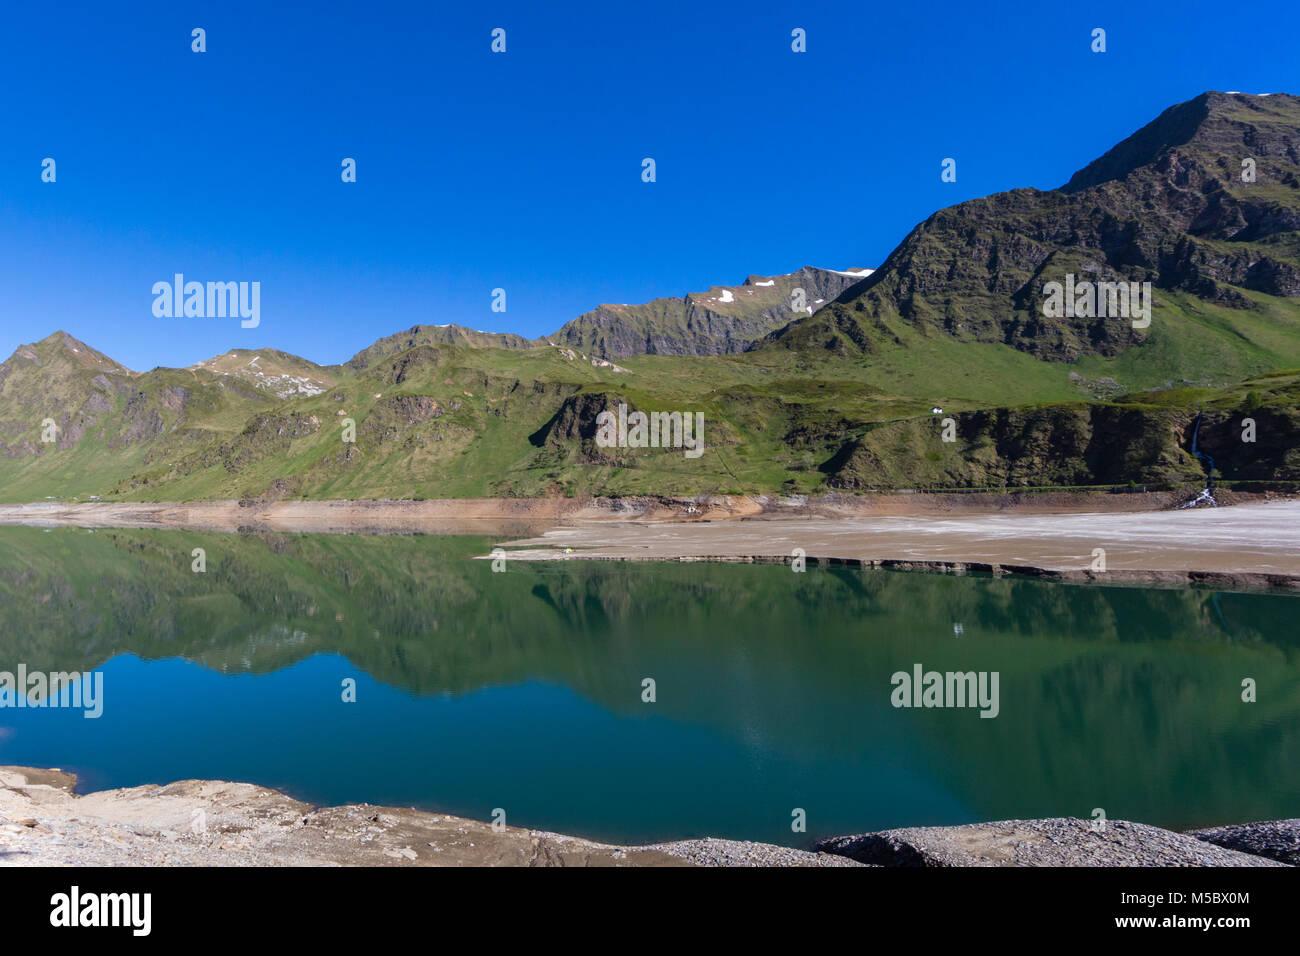 lake Ritom in canton ticino Piora valley with natural mountains Stock Photo